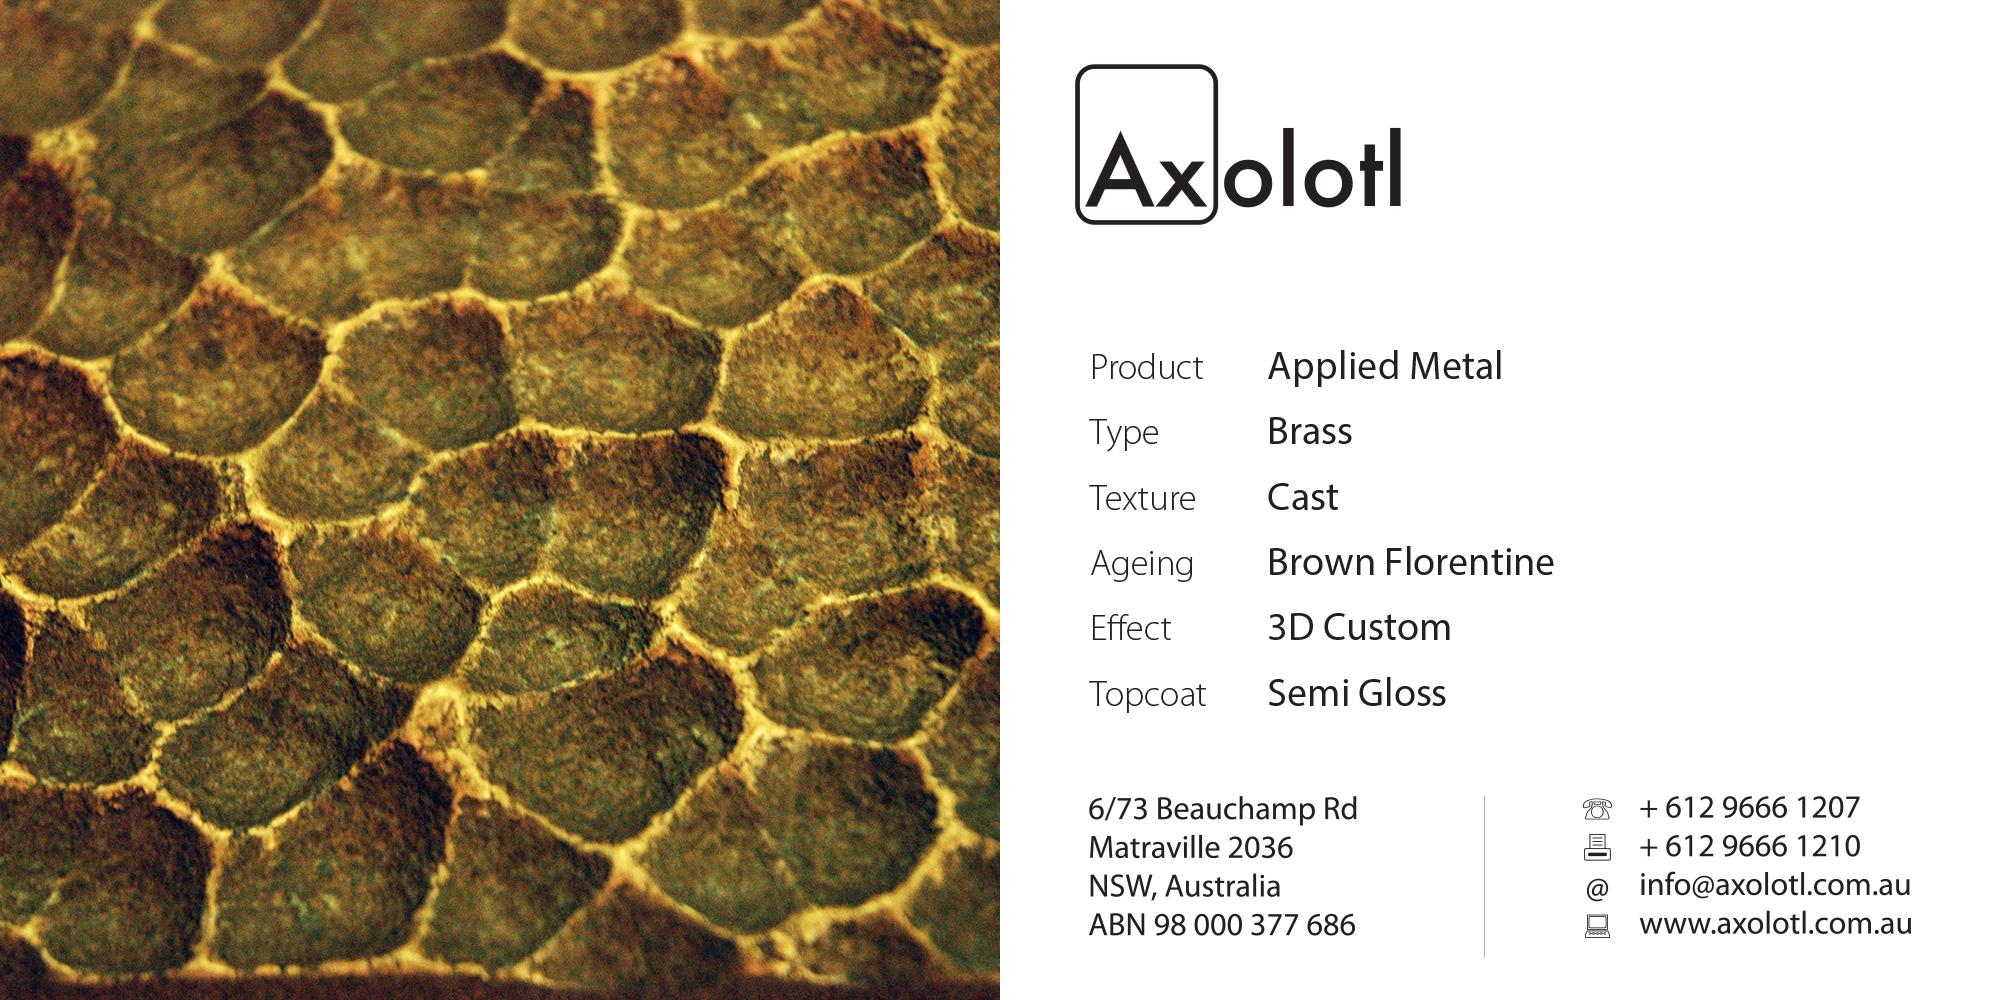 Axolotl_BrassBrownFlorentine_Cast3DSample.jpg